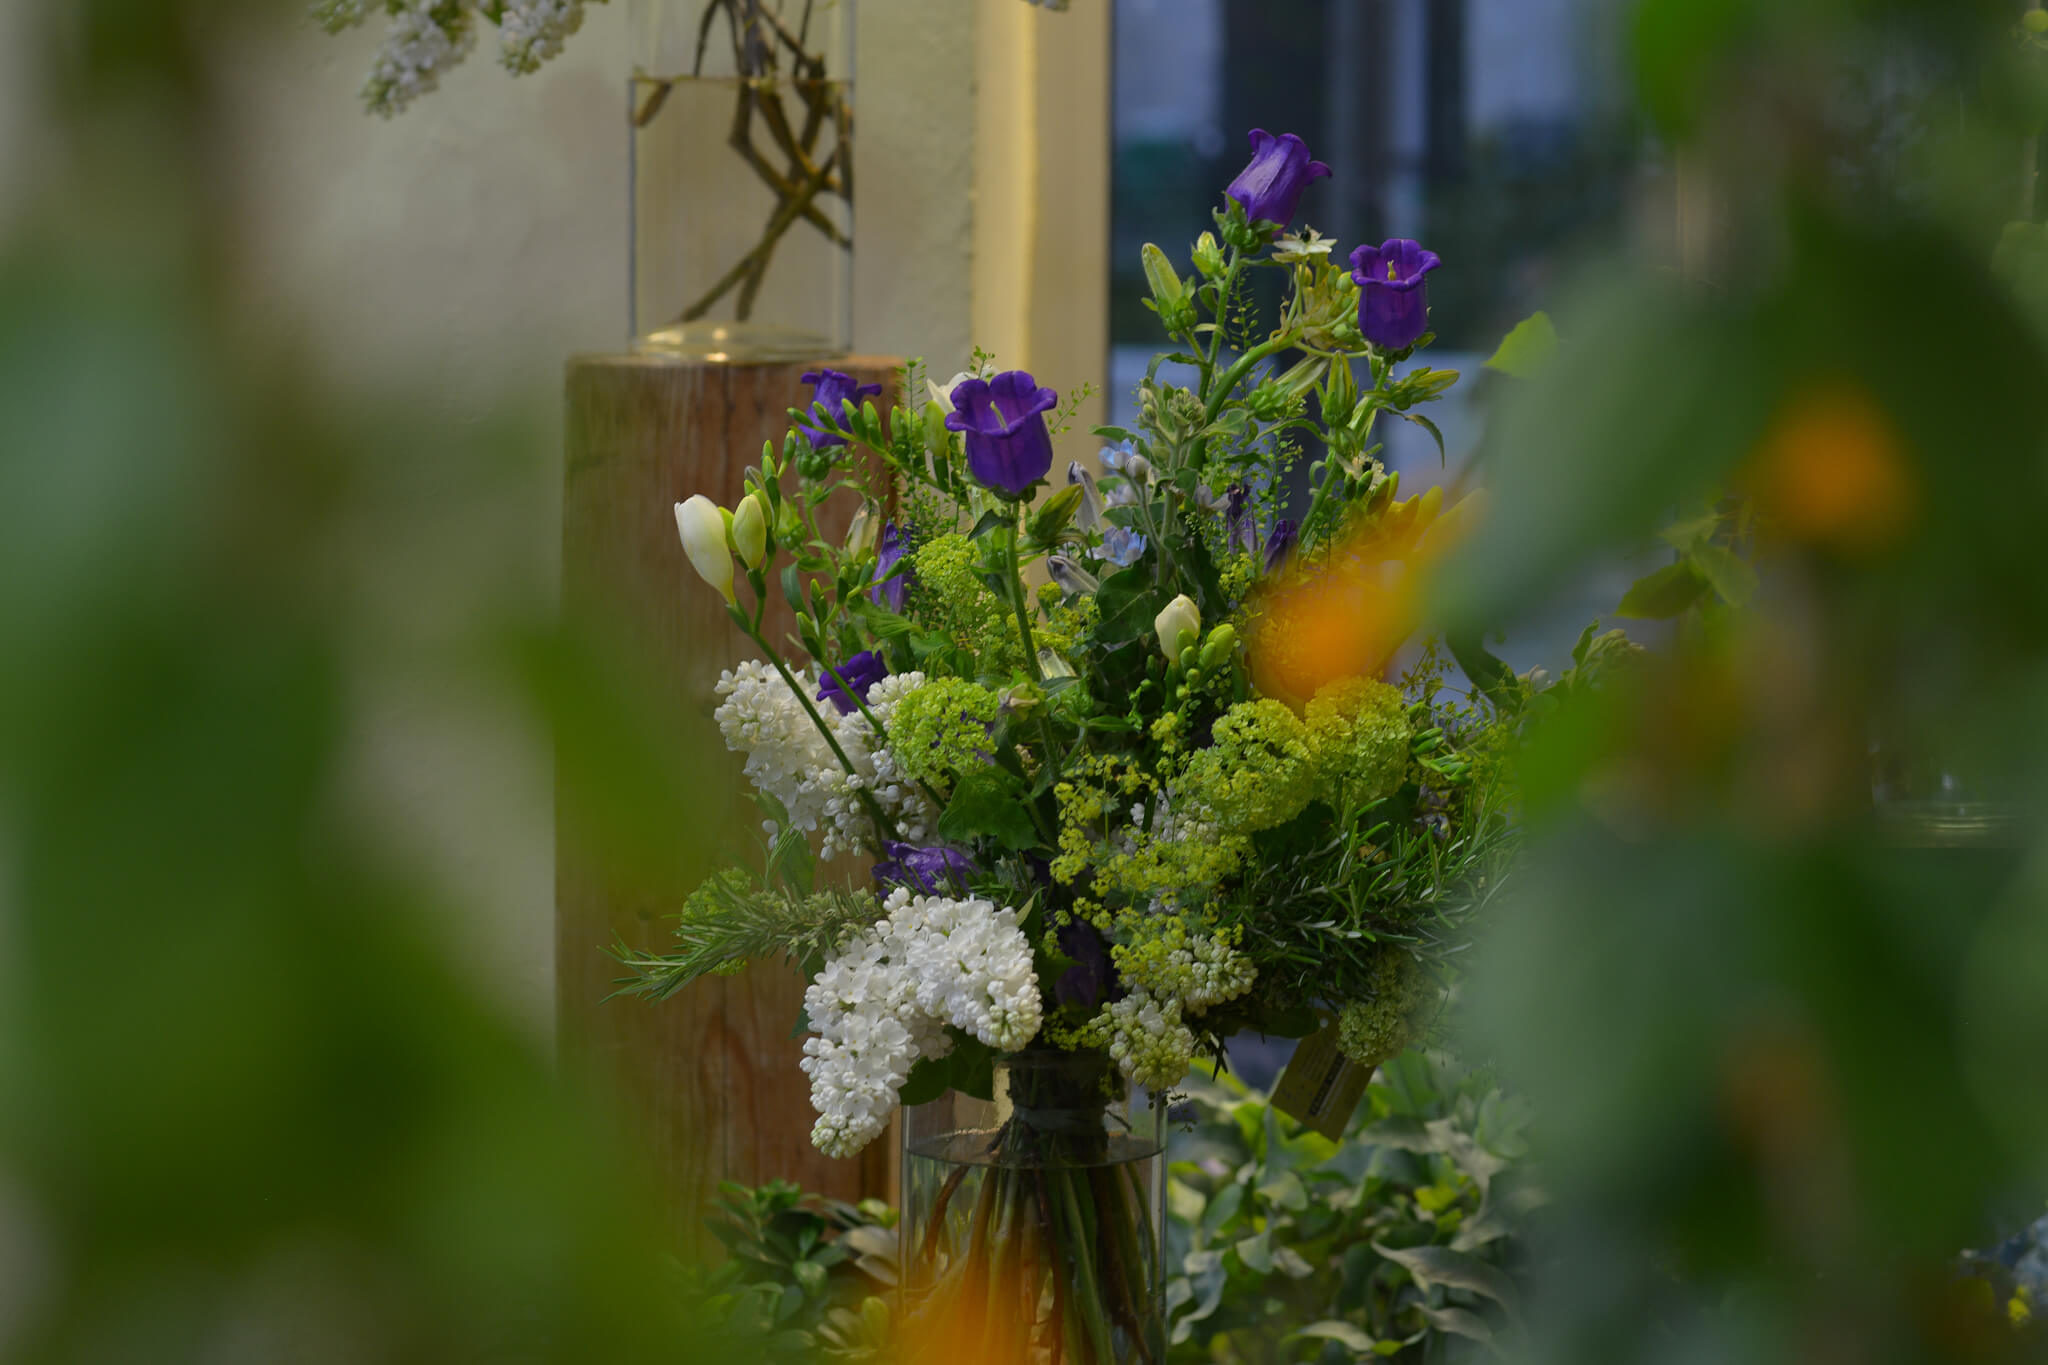 Blumen Hiedl Kempten Fruehlingsstrauss